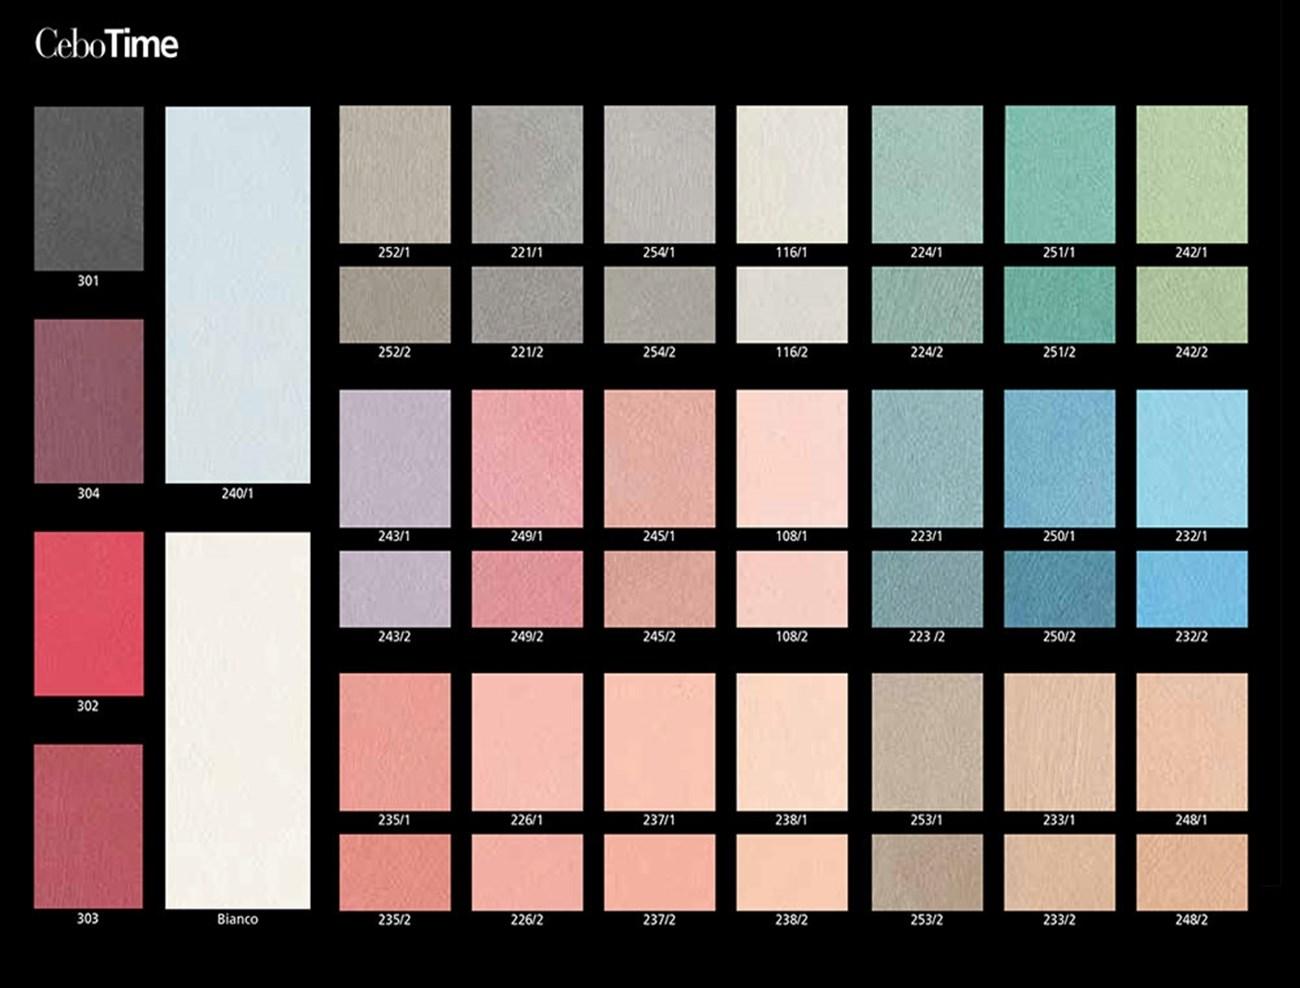 Elegant cartella colori cebotime with tabella colori pareti for Tabella colori per pareti interne